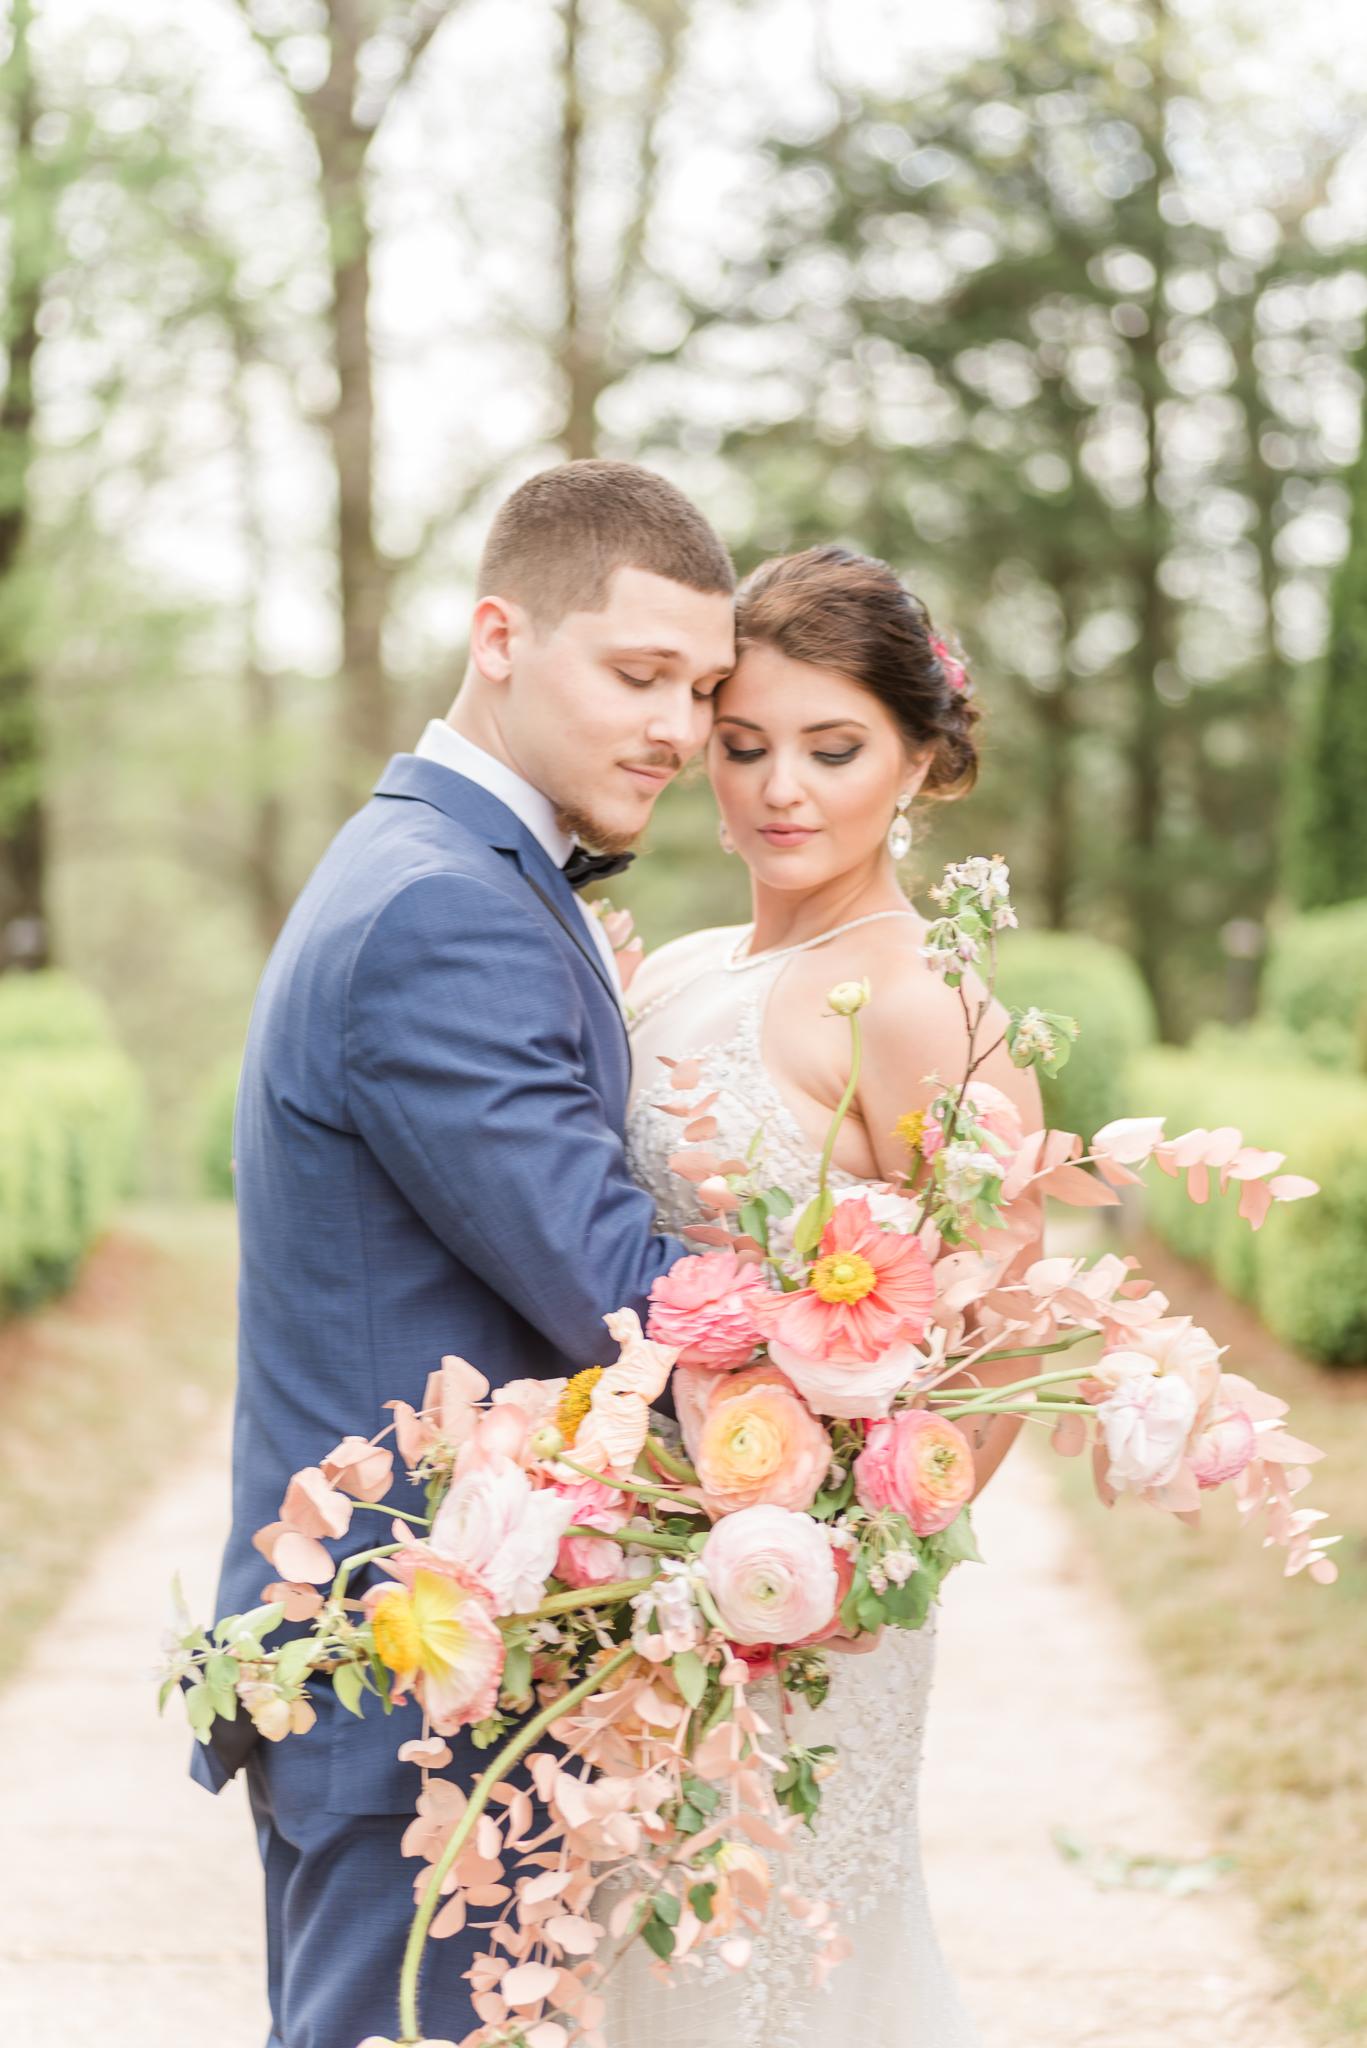 The Best Destination Wedding Photographers.jpg